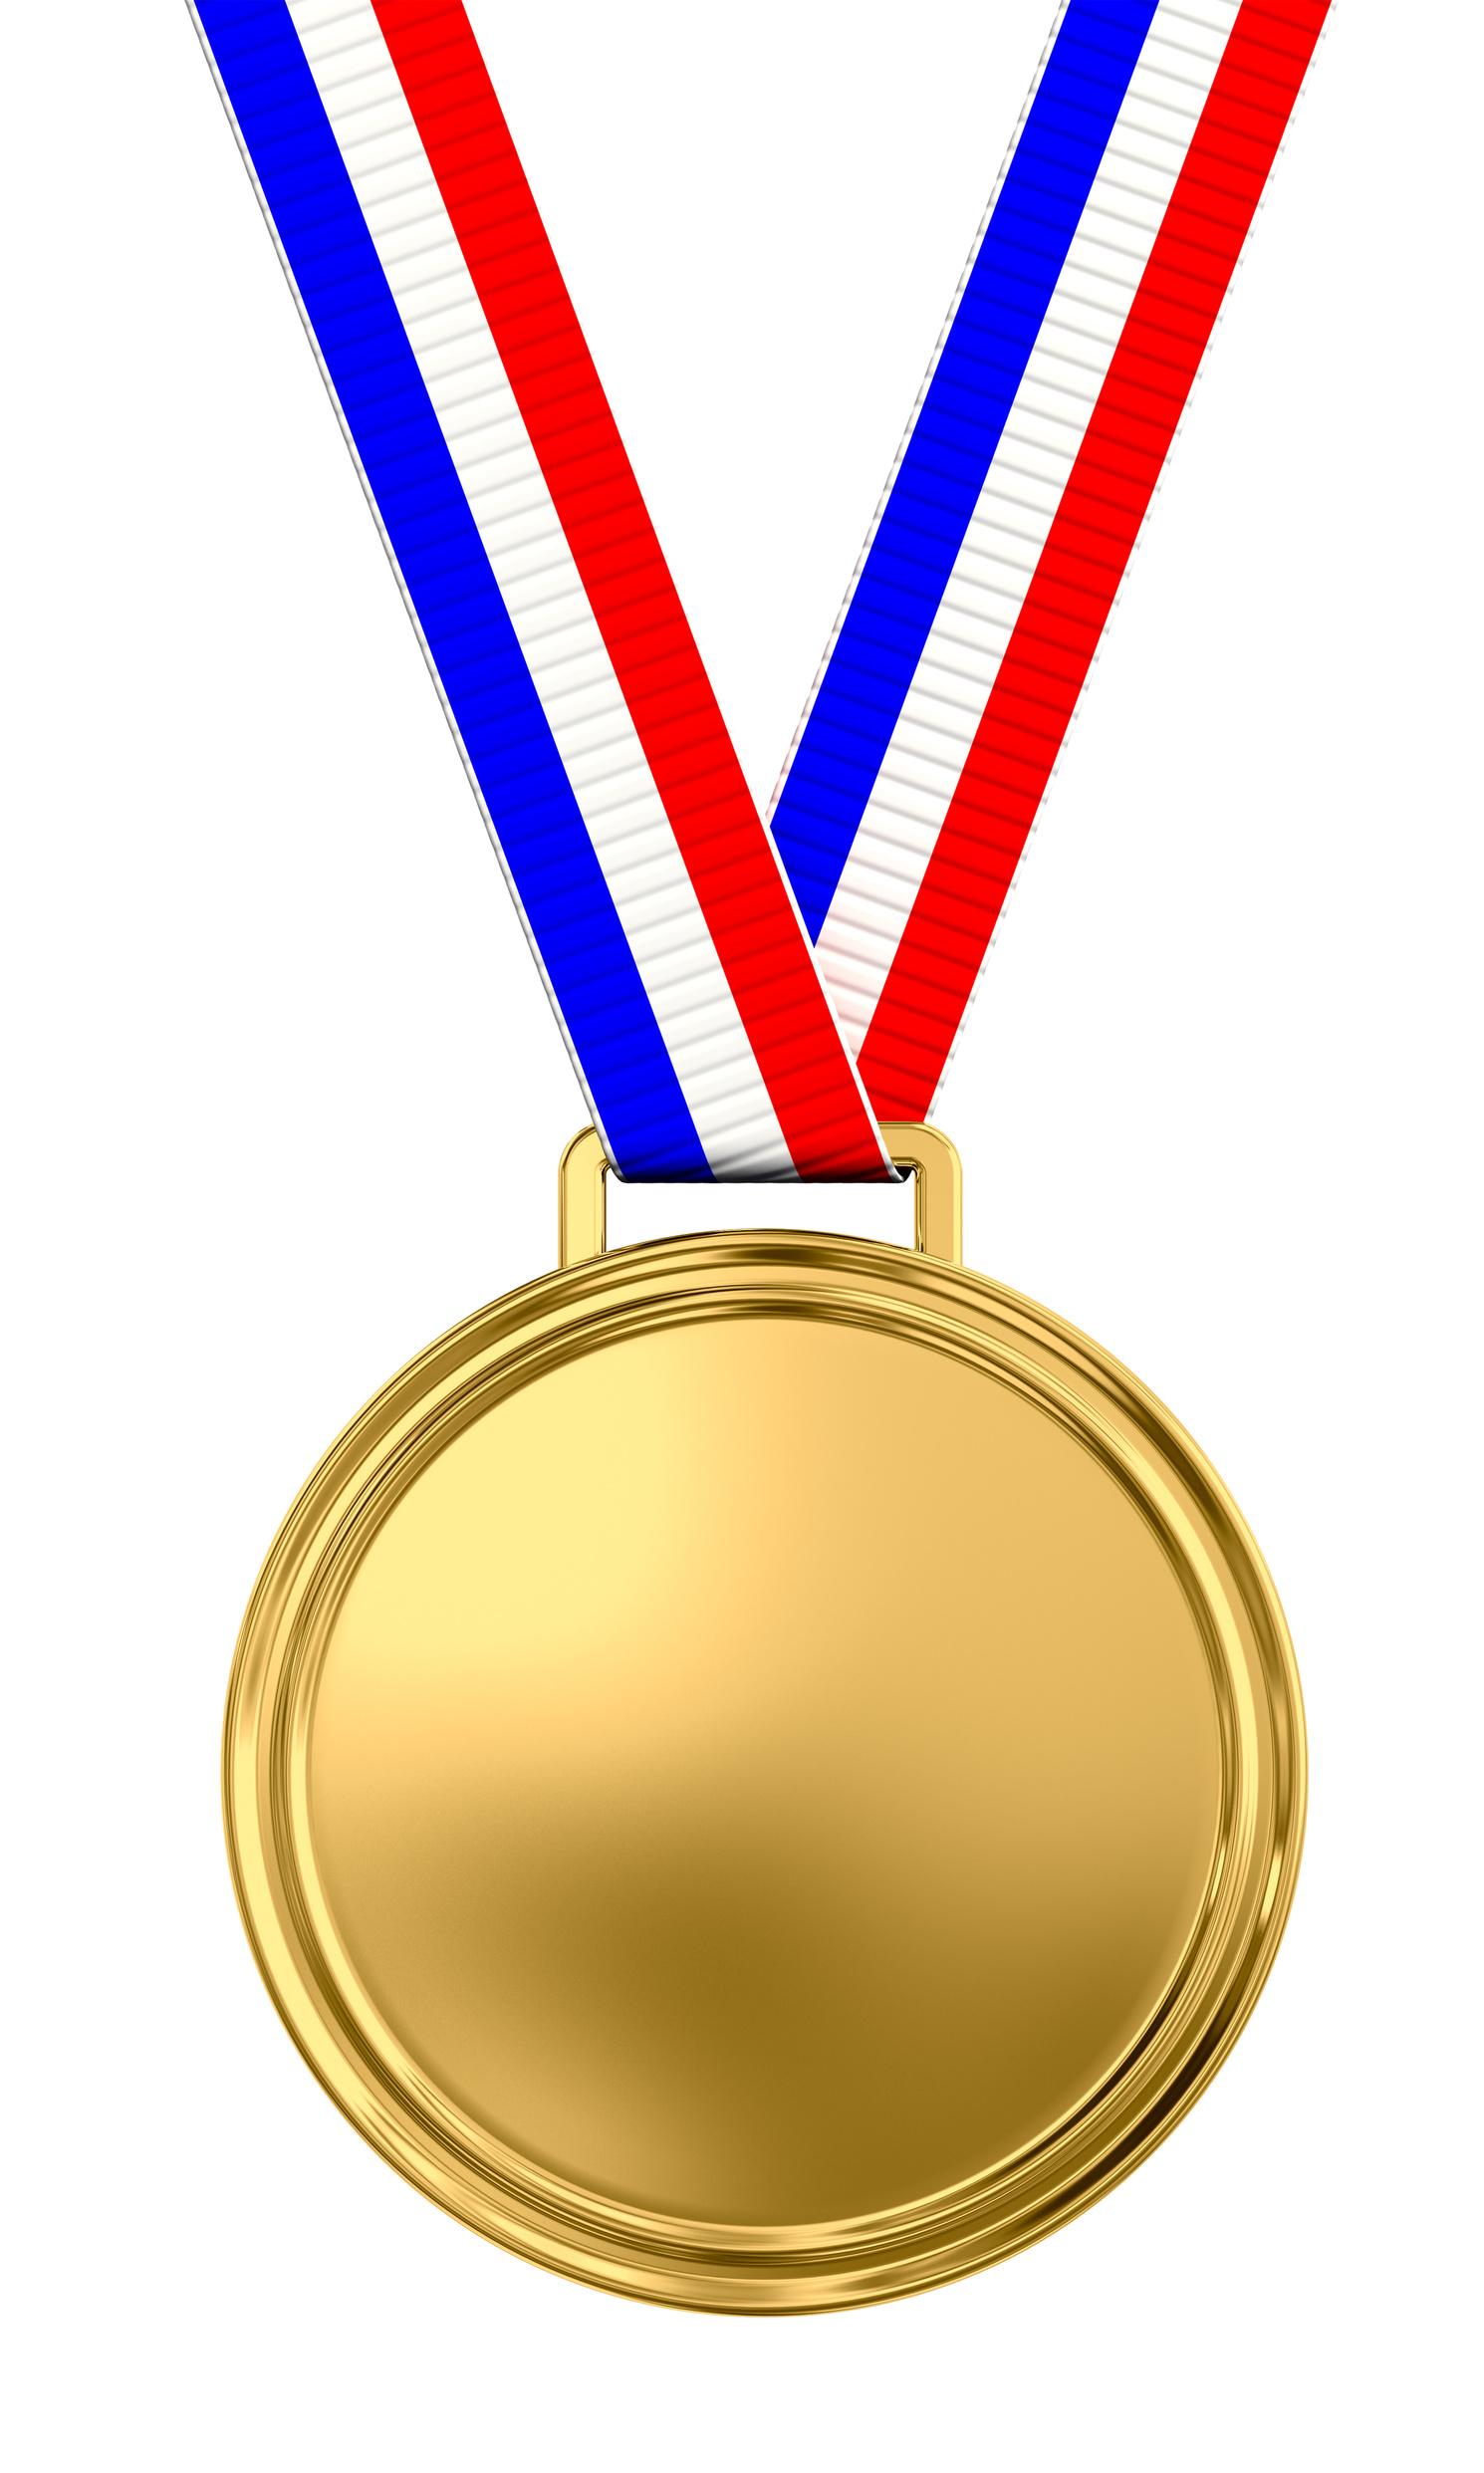 1 clipart medal. Gold timmins ringette association